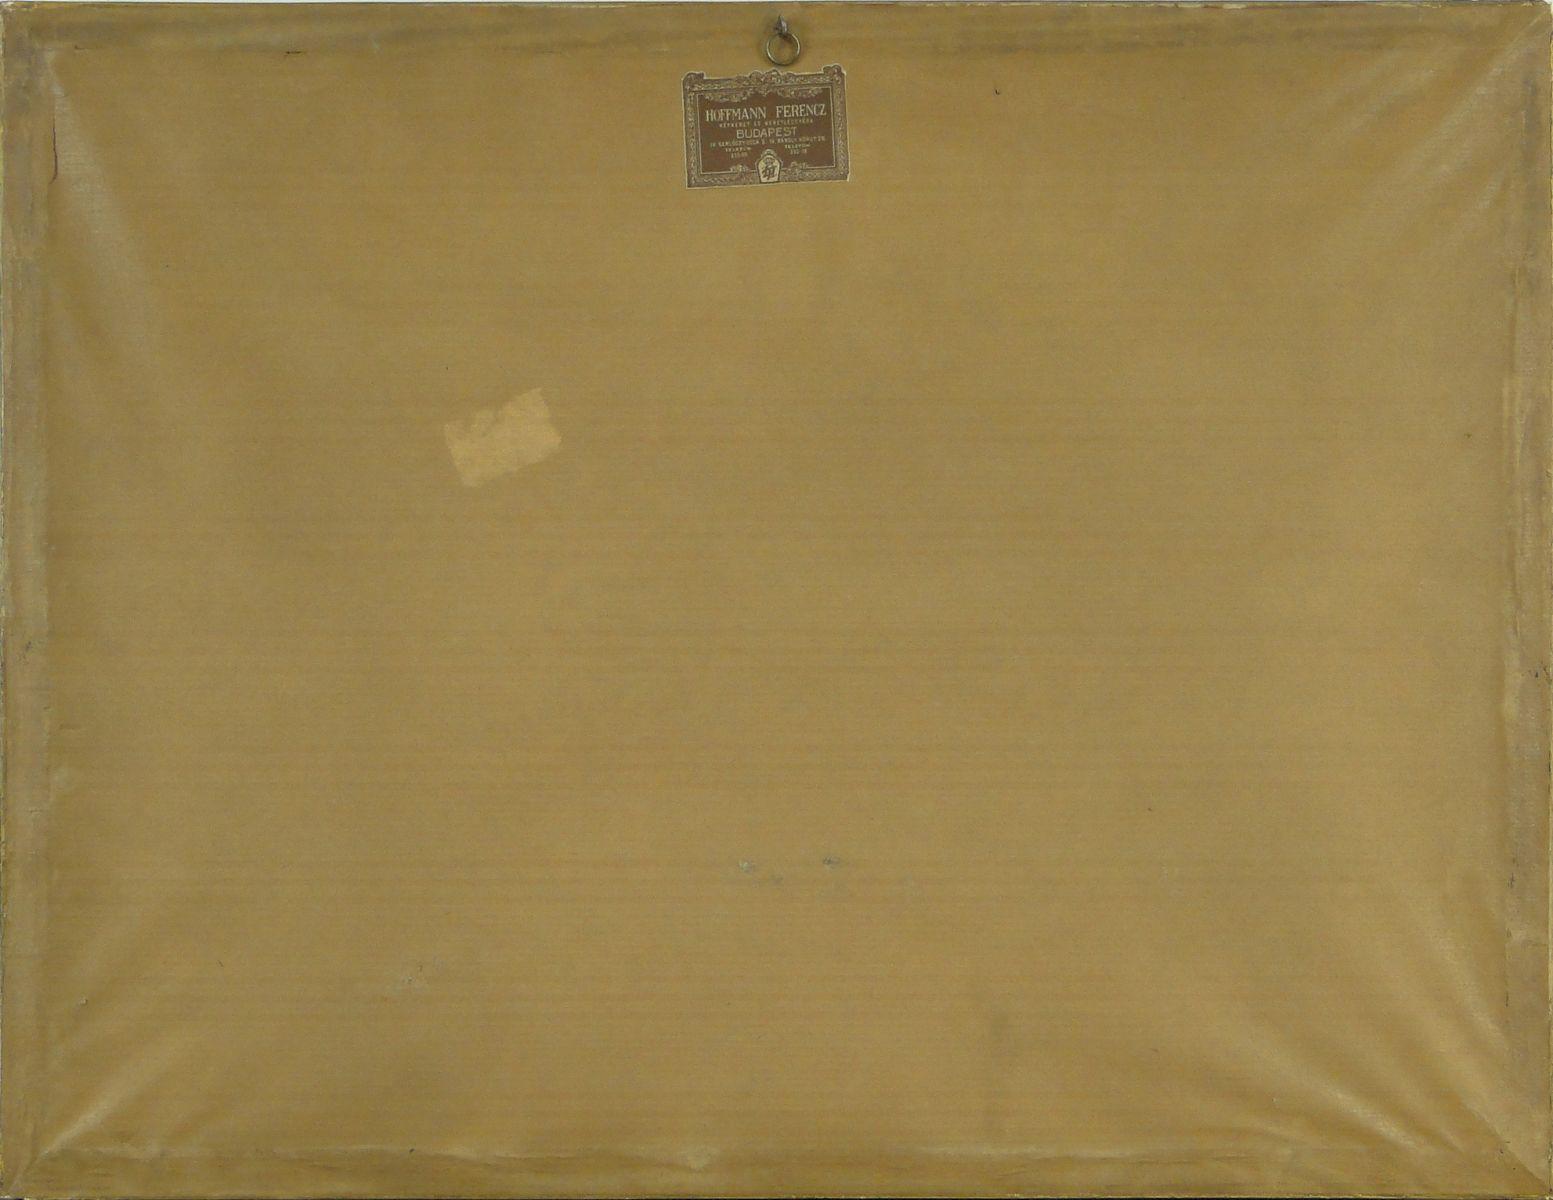 DSC02912.JPG (1553×1200)